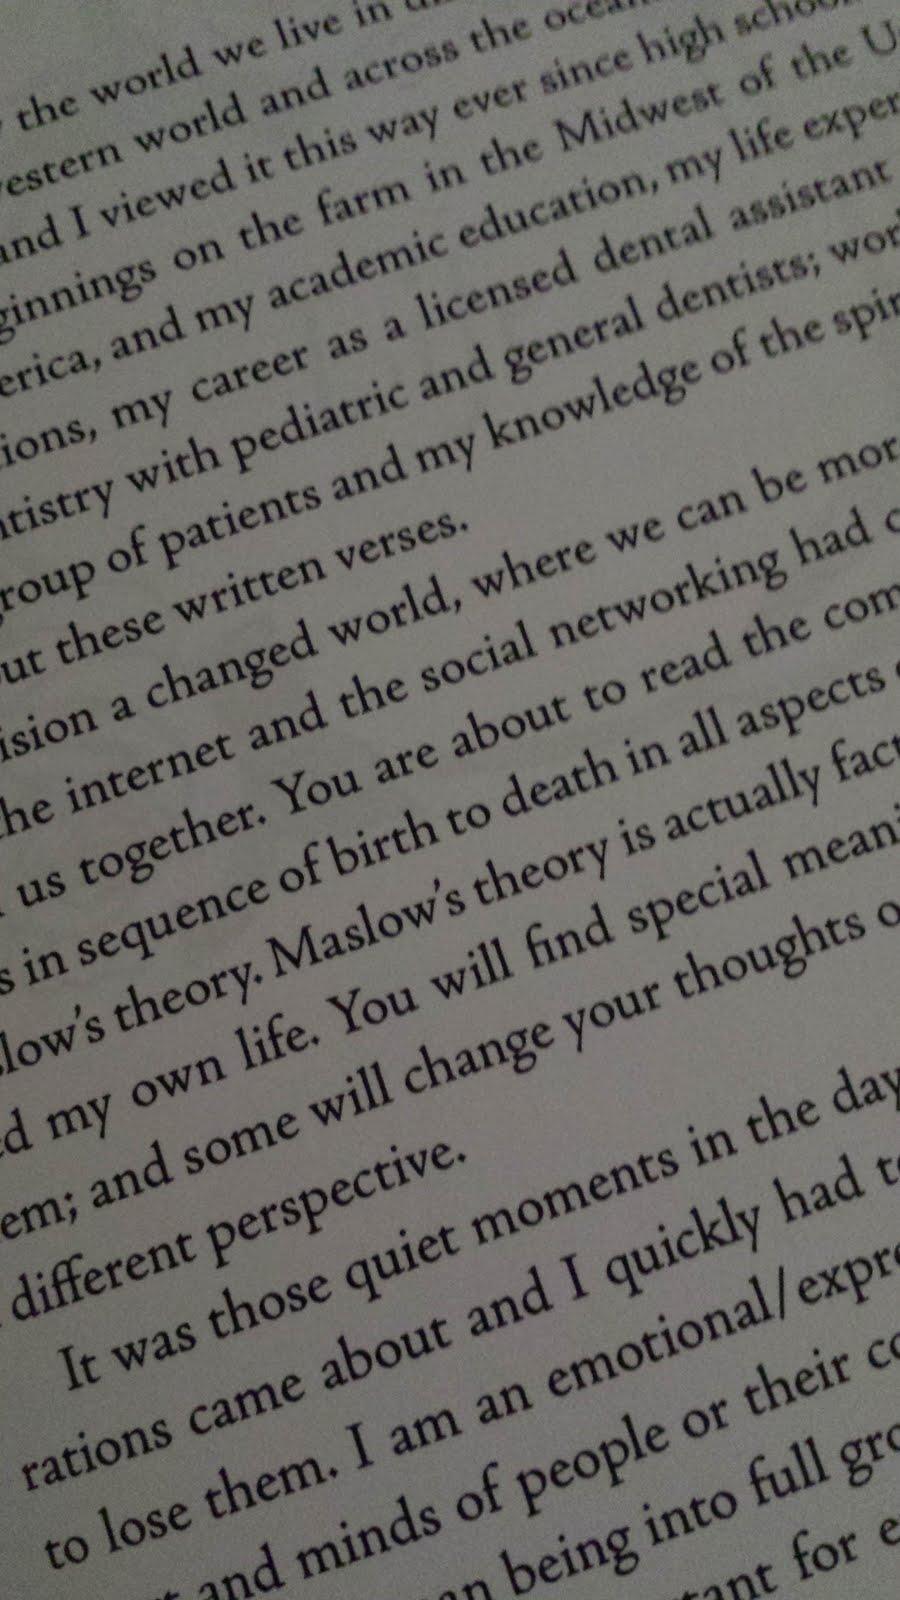 Preface in my book.